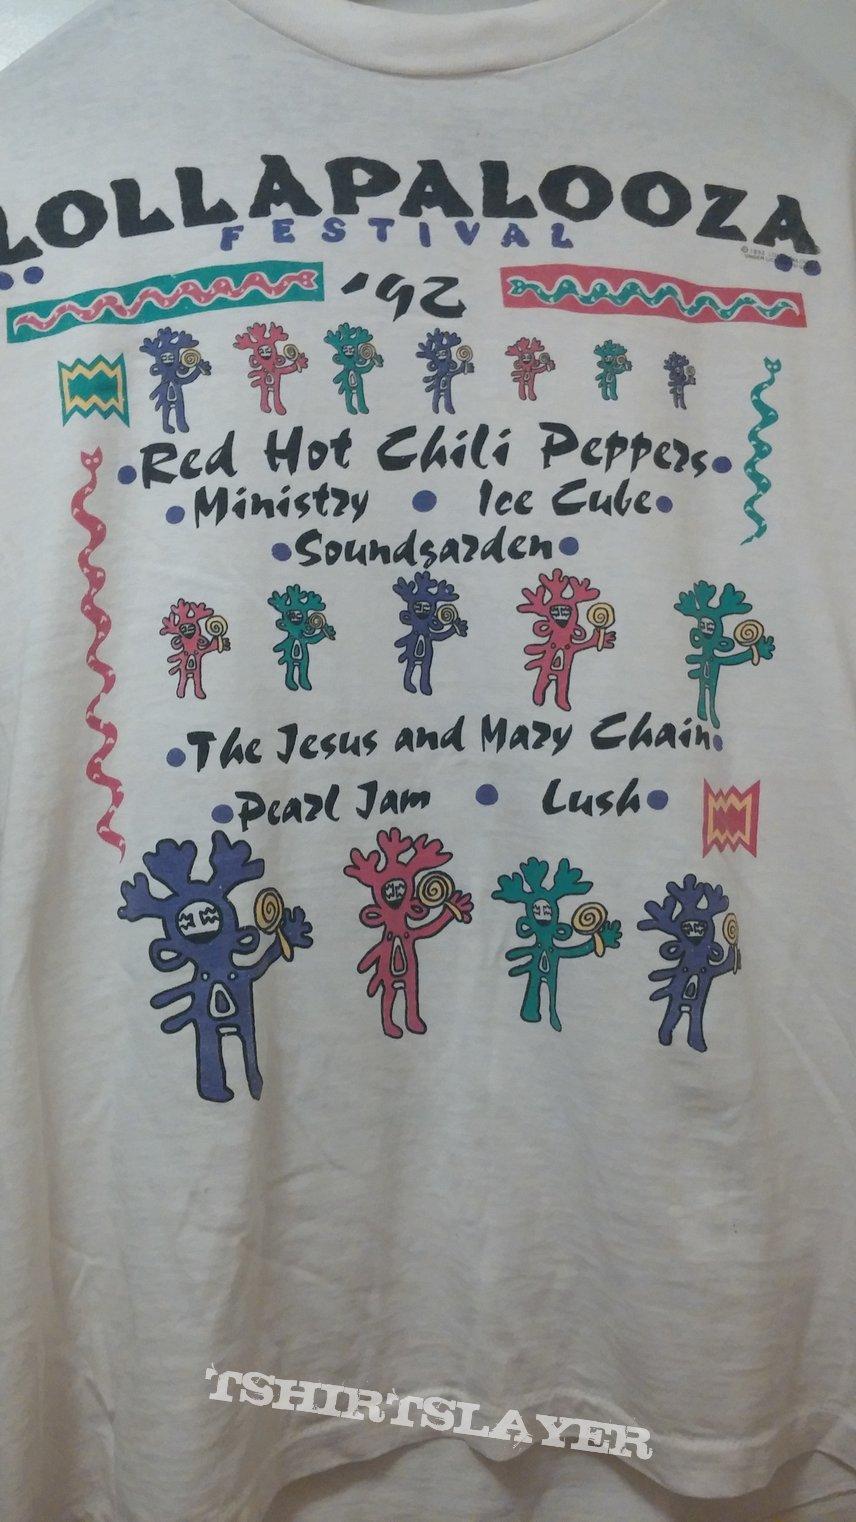 Lollapalooza '92 t-shirt